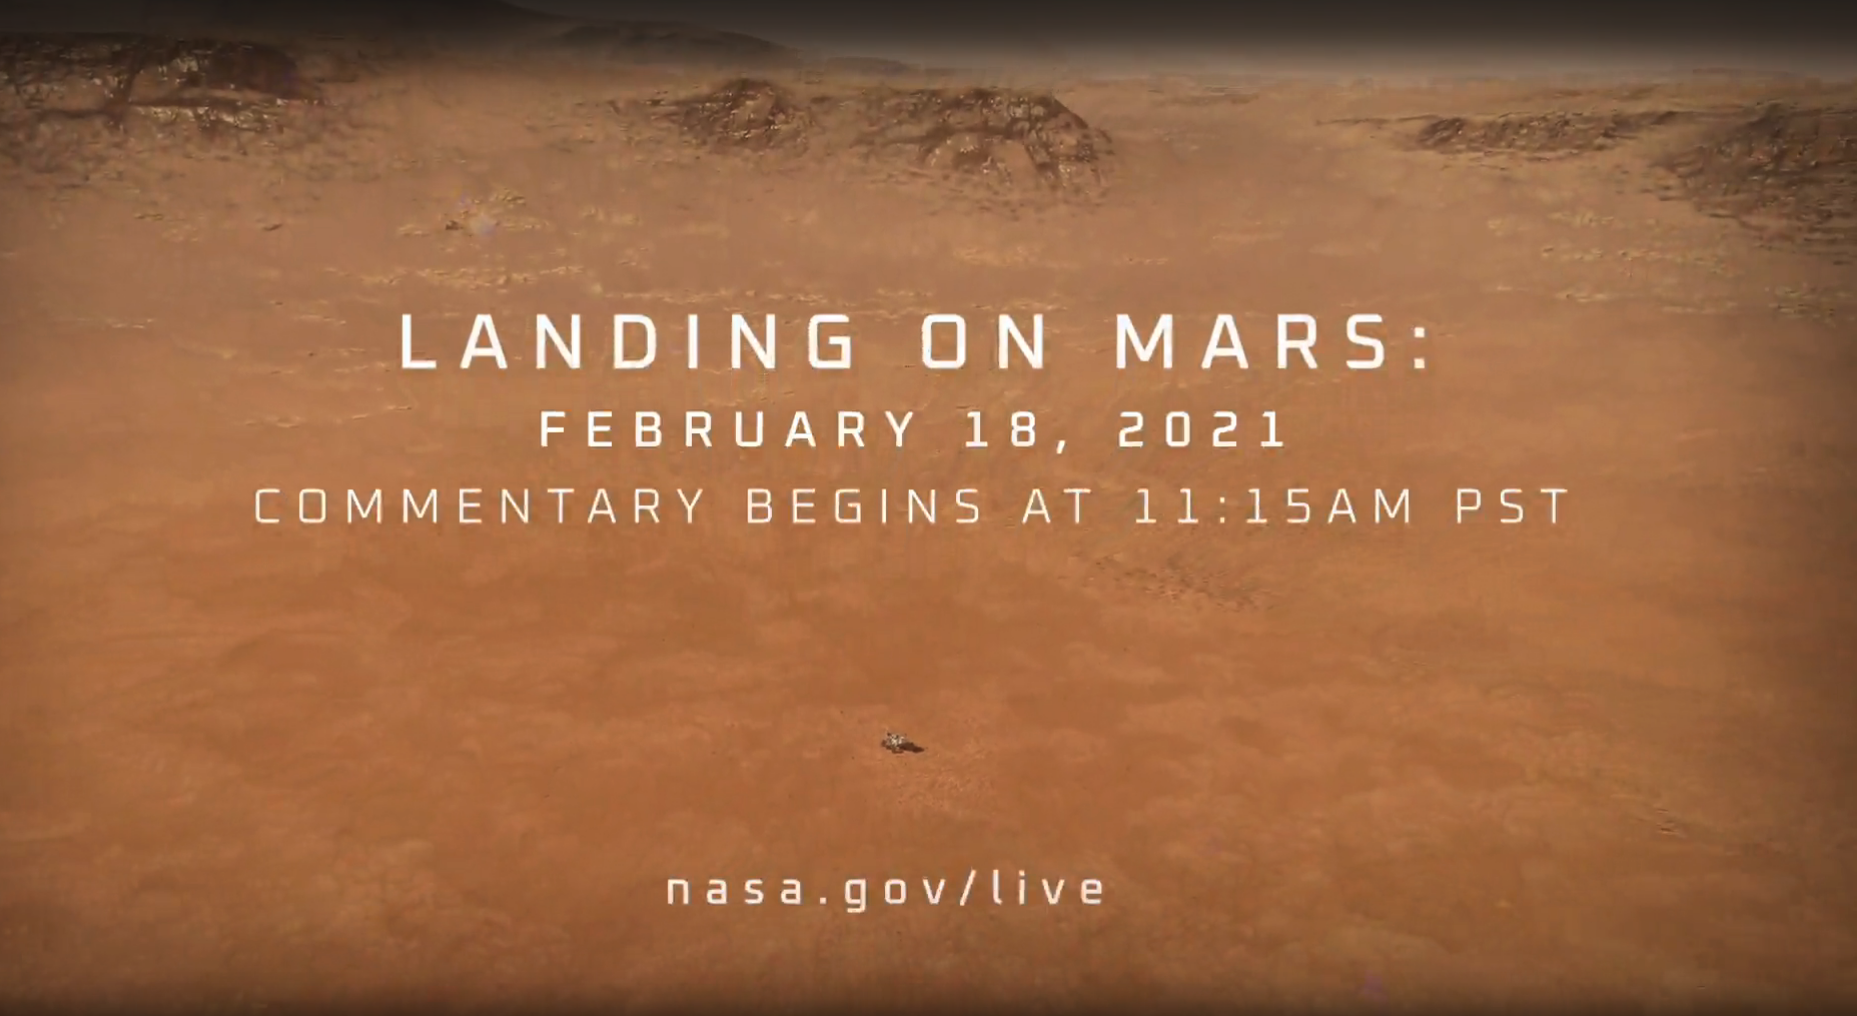 NASA &Discovery Education Invite Educators & Studentsto Explore MarsThrough Livestreamof Perseverance Rover's Landing